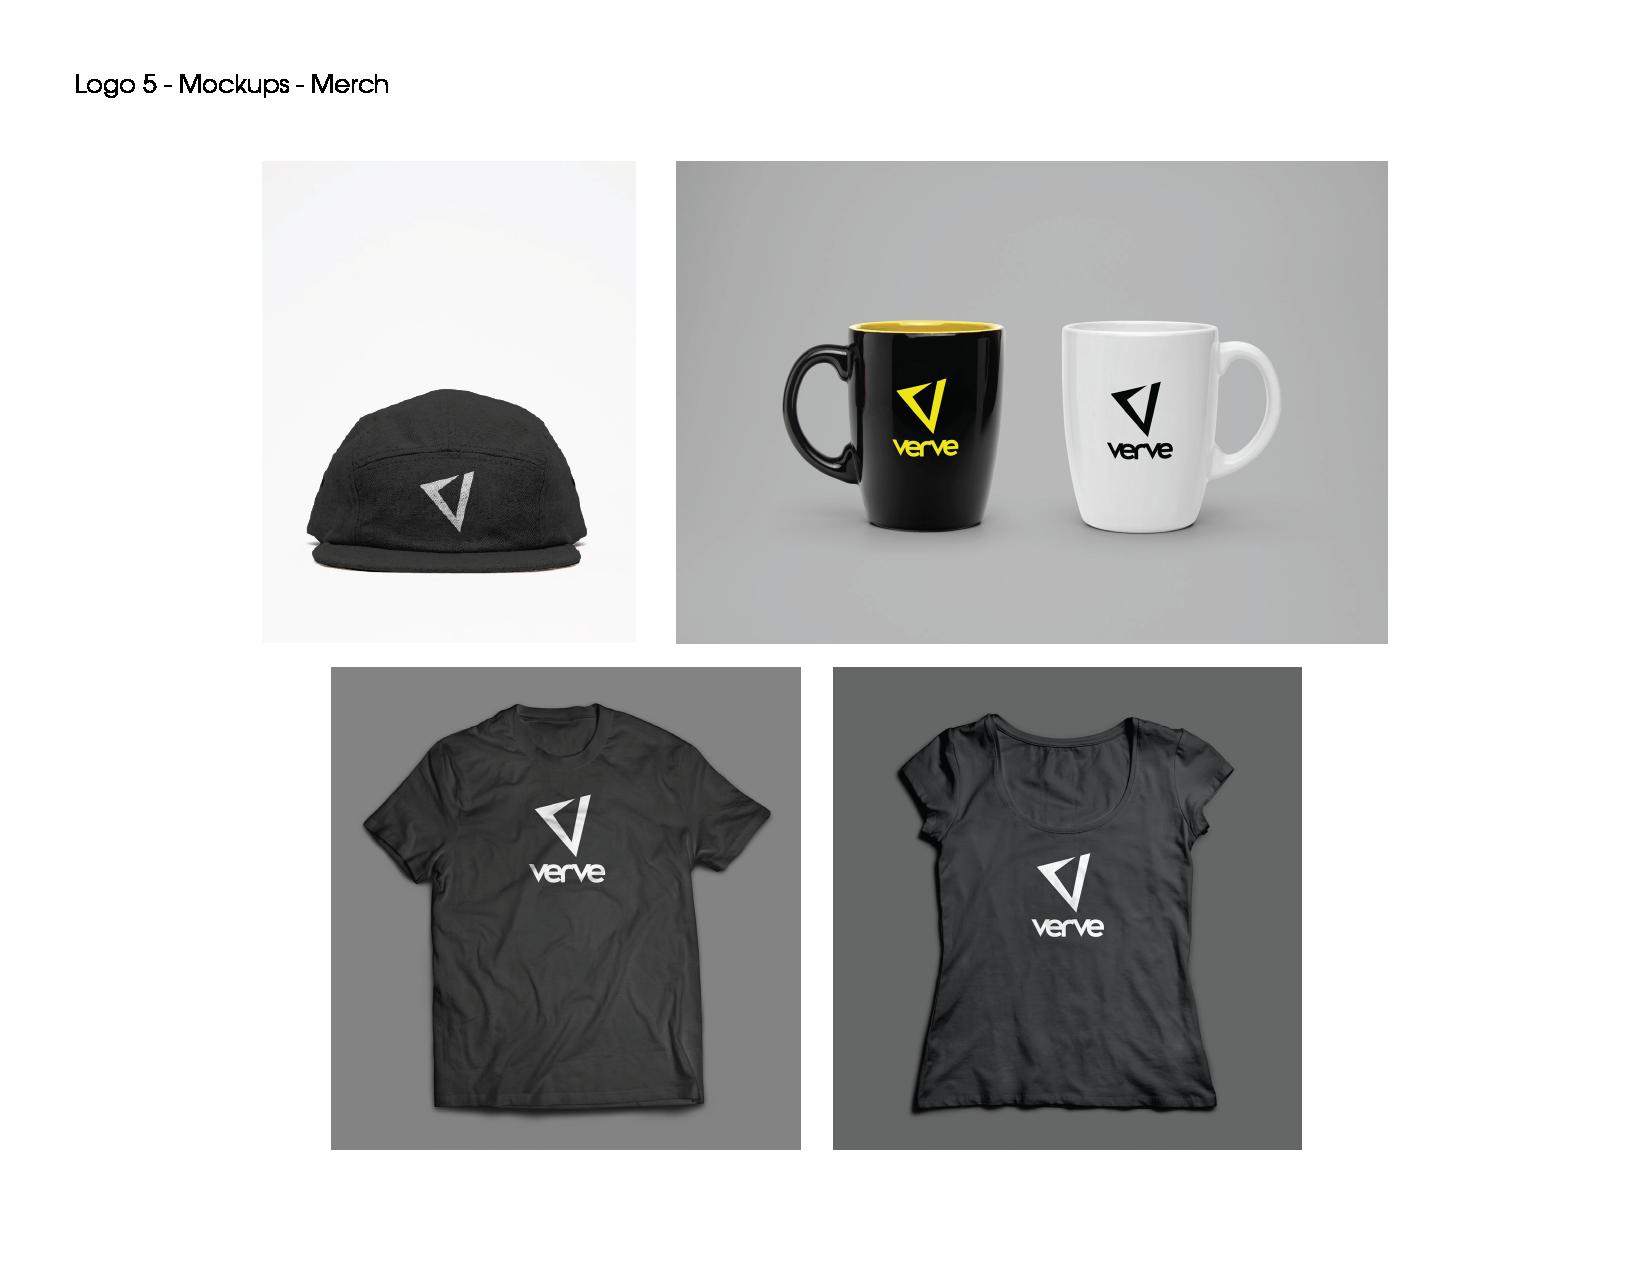 VRV_Logos_Stage_1_Round2-28.png